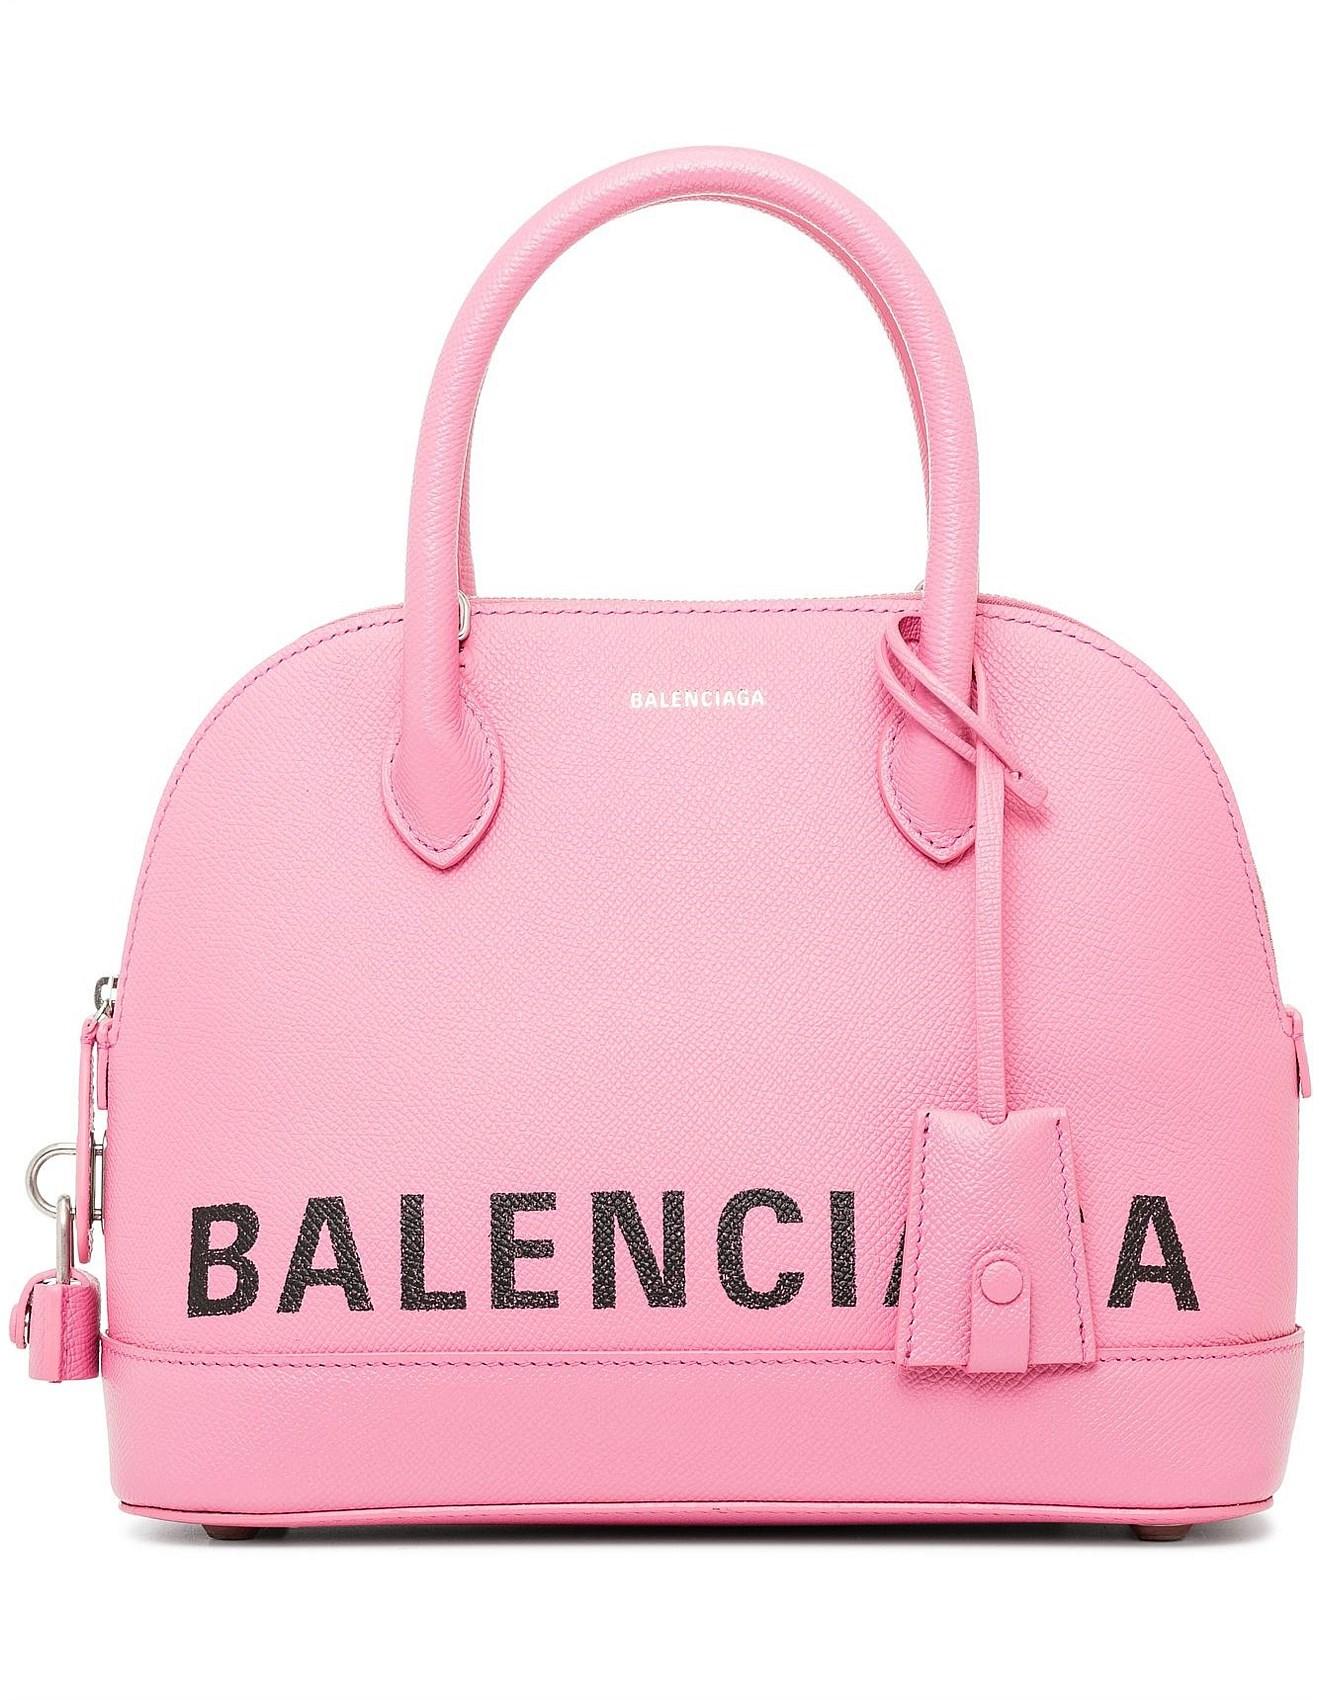 96c4c0b4732 Designer Handbags For Women   Buy Ladies Bags Online   David Jones - VILLE  TOP HANDLE BAG SMALL AJ